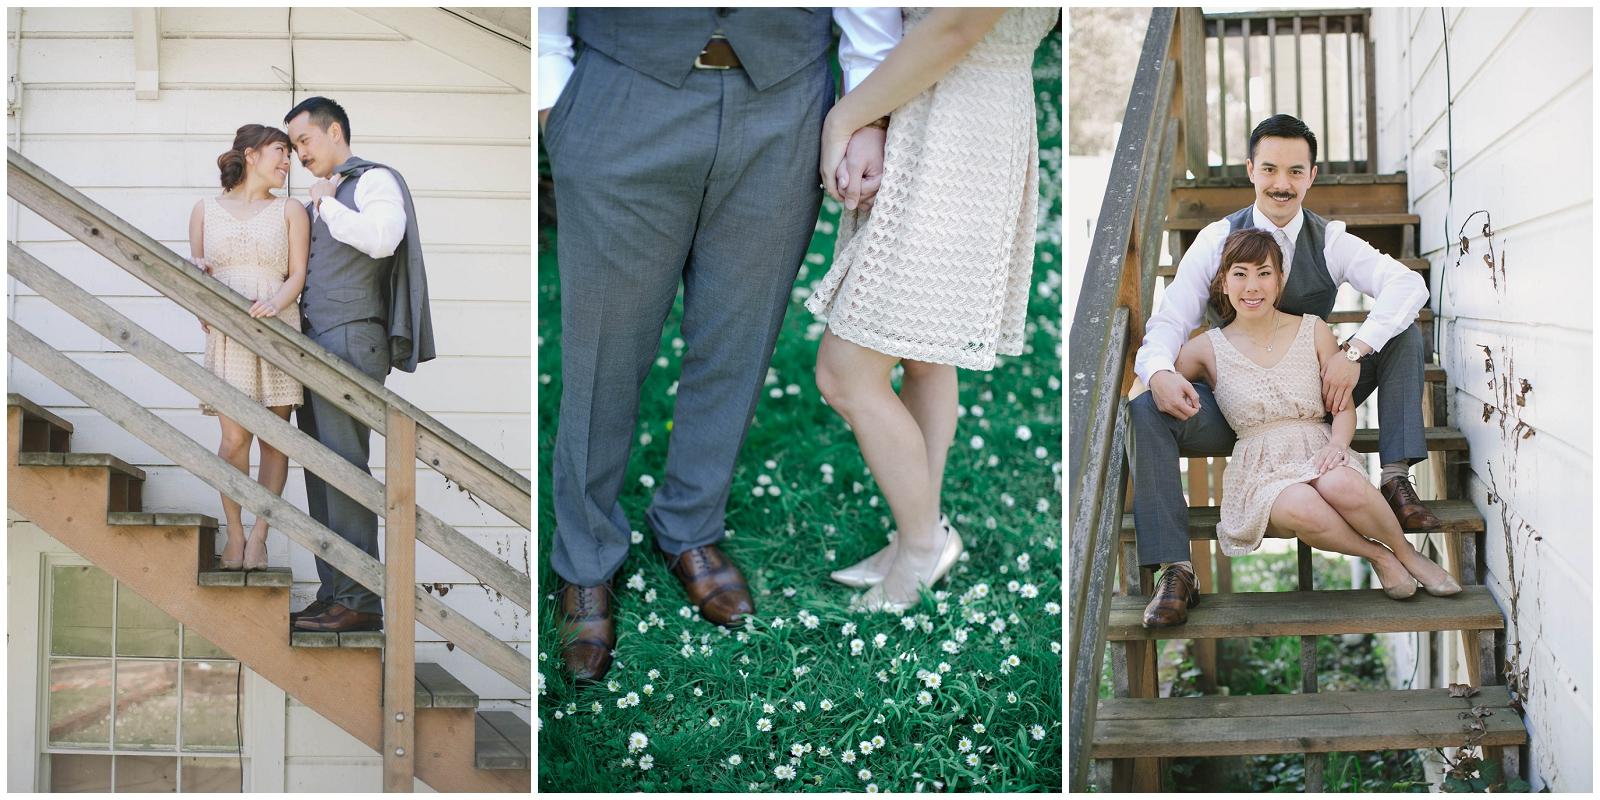 San-Francisco-Bay-Area-Wedding-Photography-Engagement-Treasure-Island-4.jpg